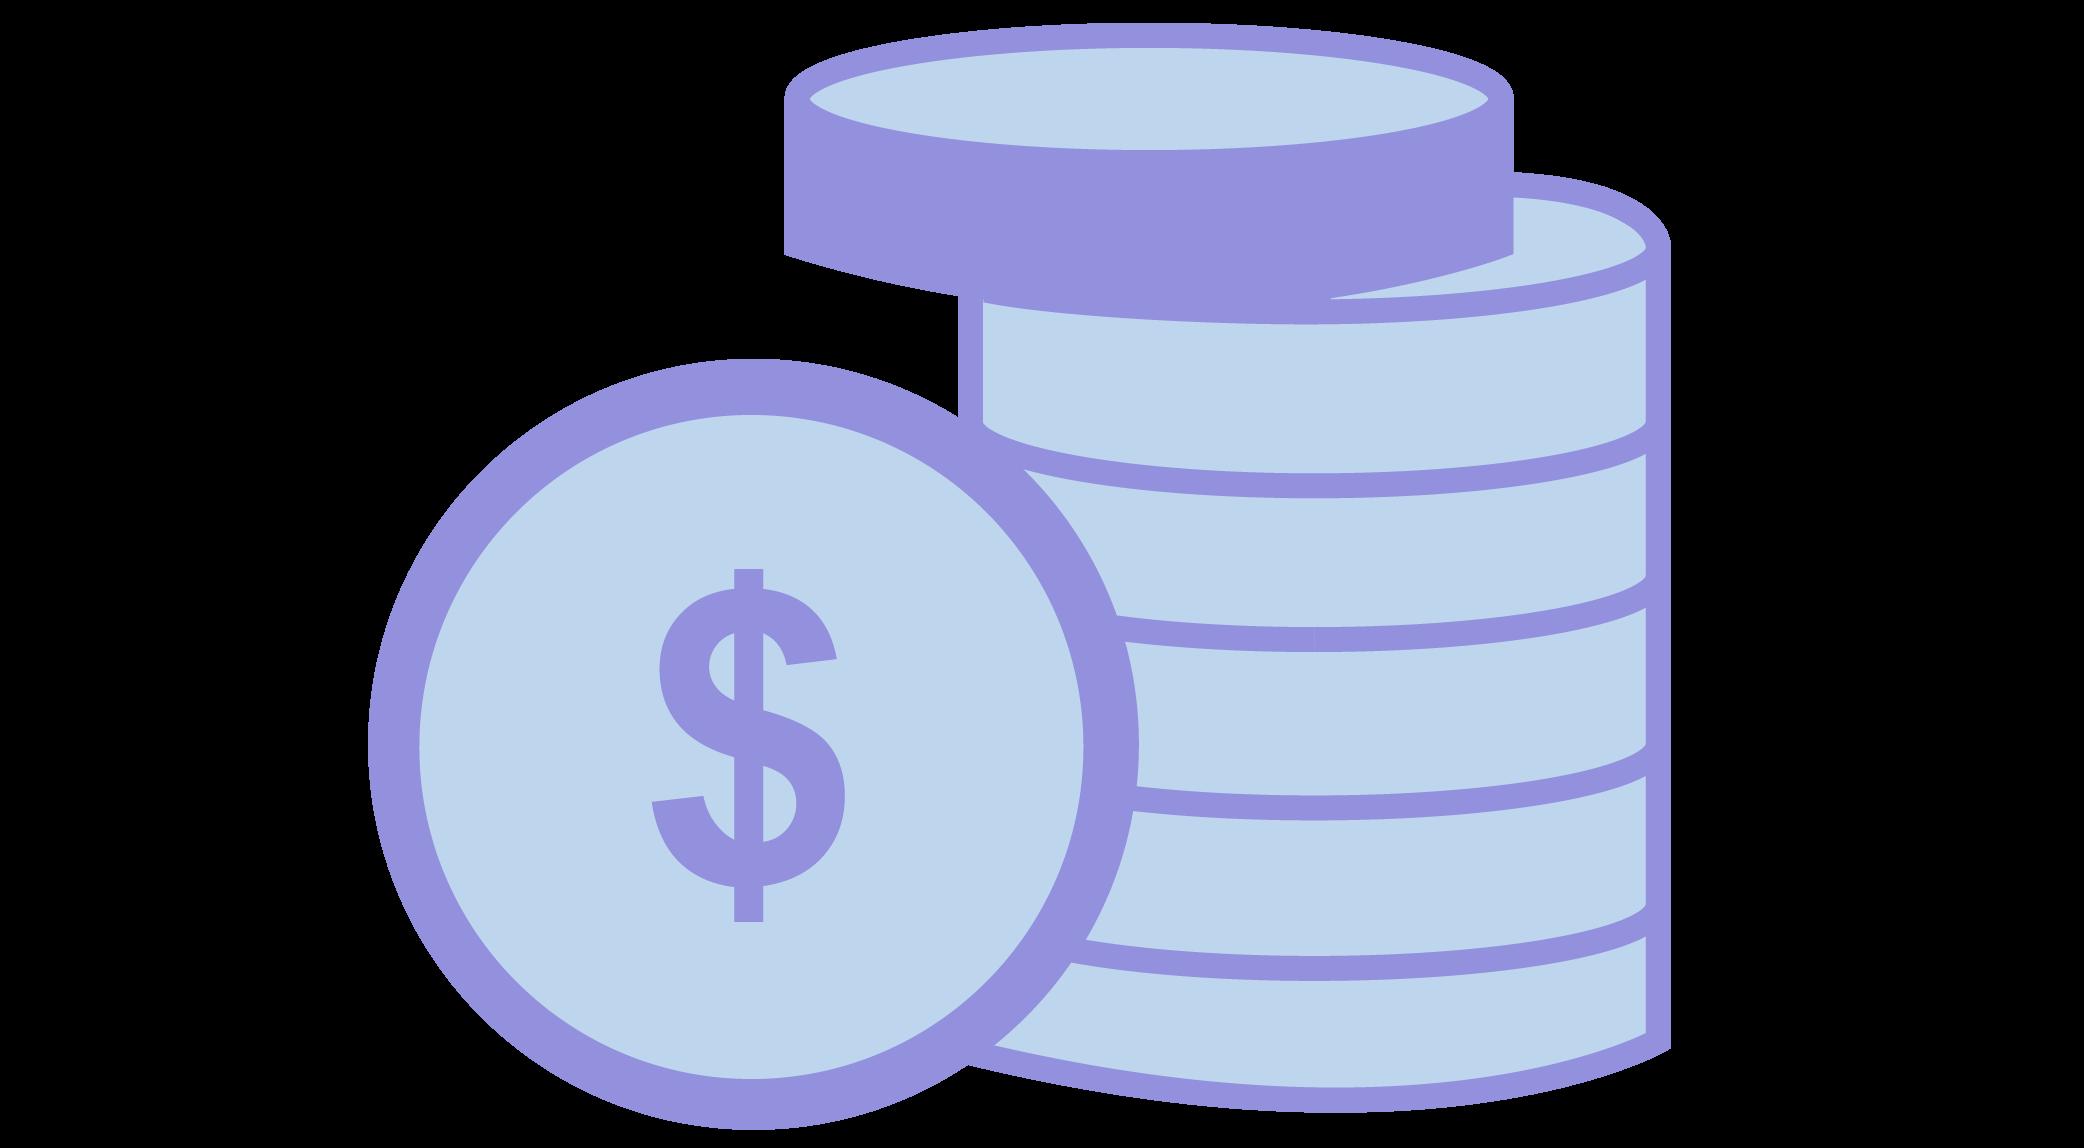 Purple coins icon